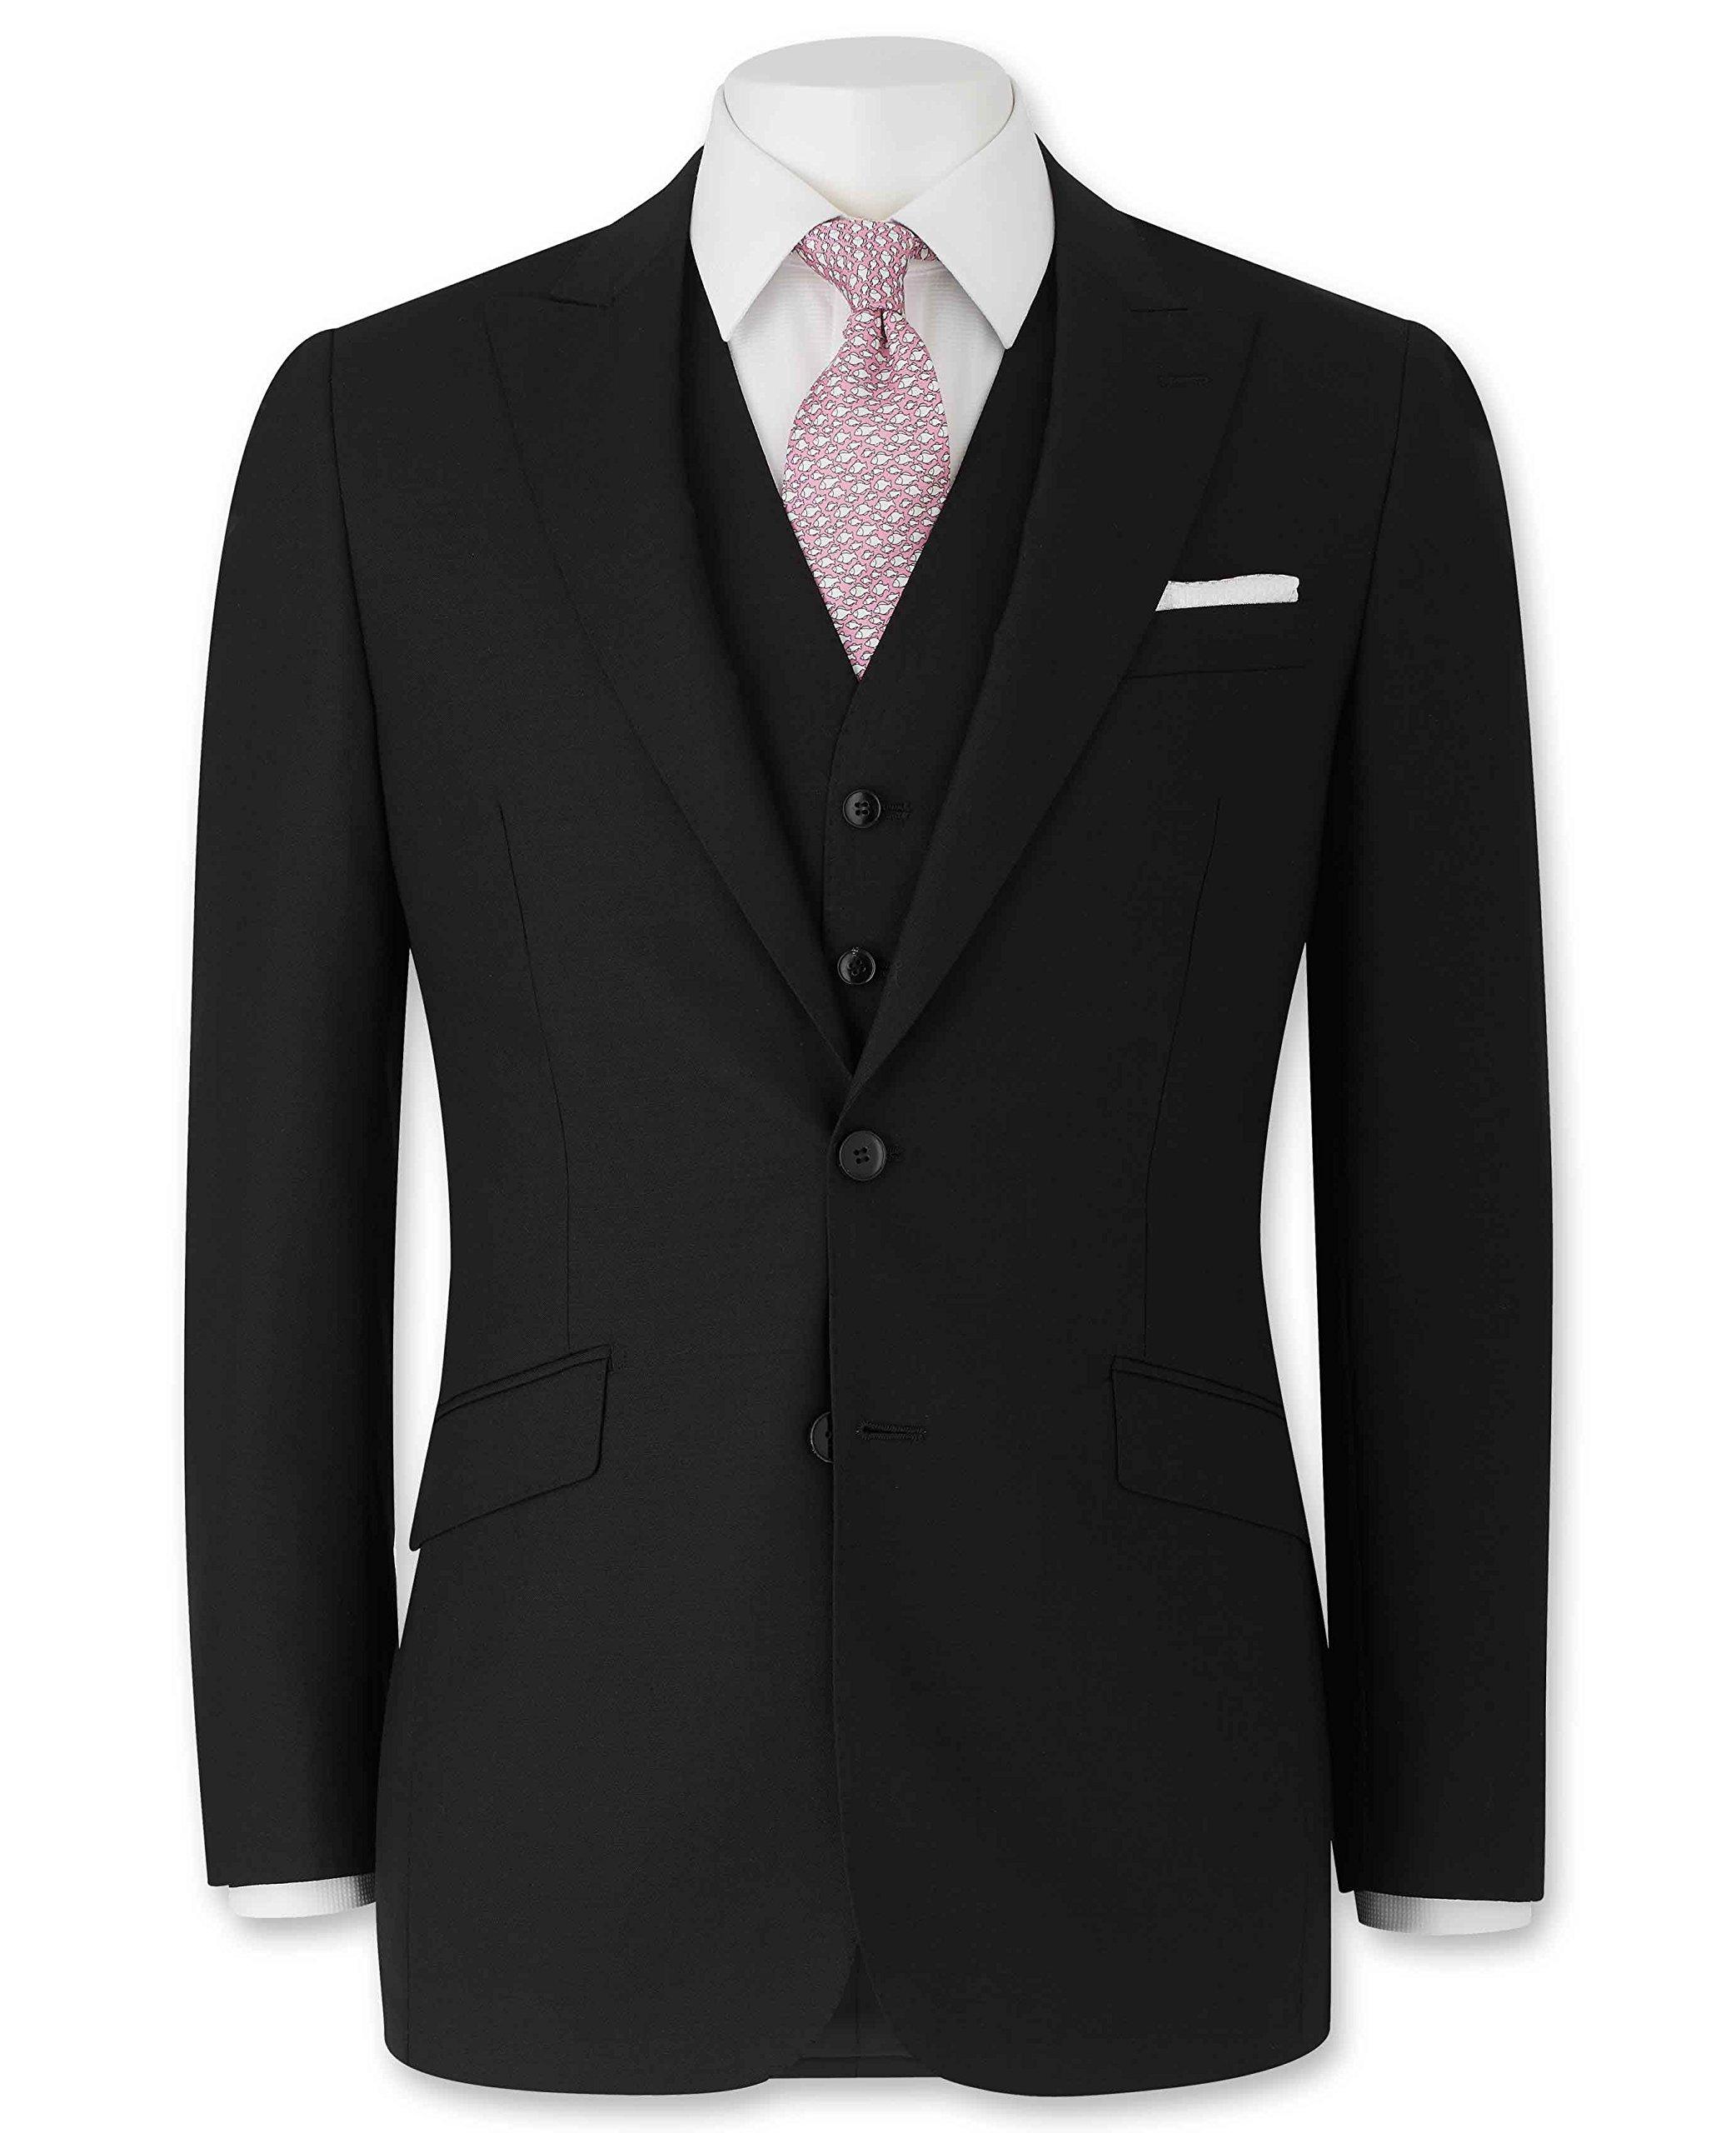 Savile Row Men's Black Tailored Business Suit Jacket 42'' Regular